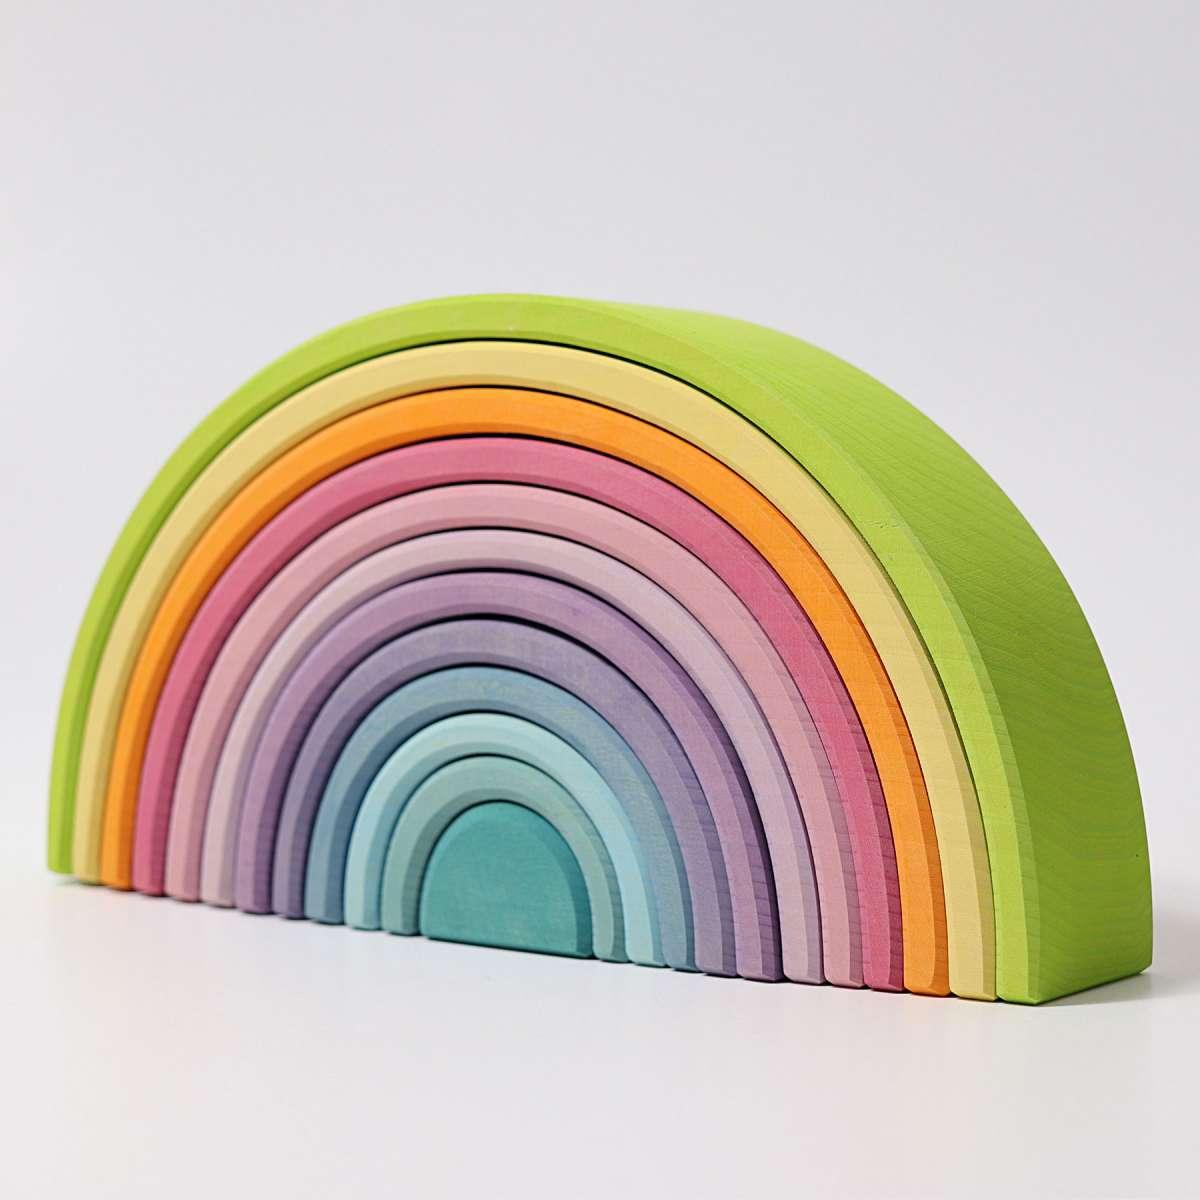 Grimms Regenbogen groß, pastellfarben,  12 teilig